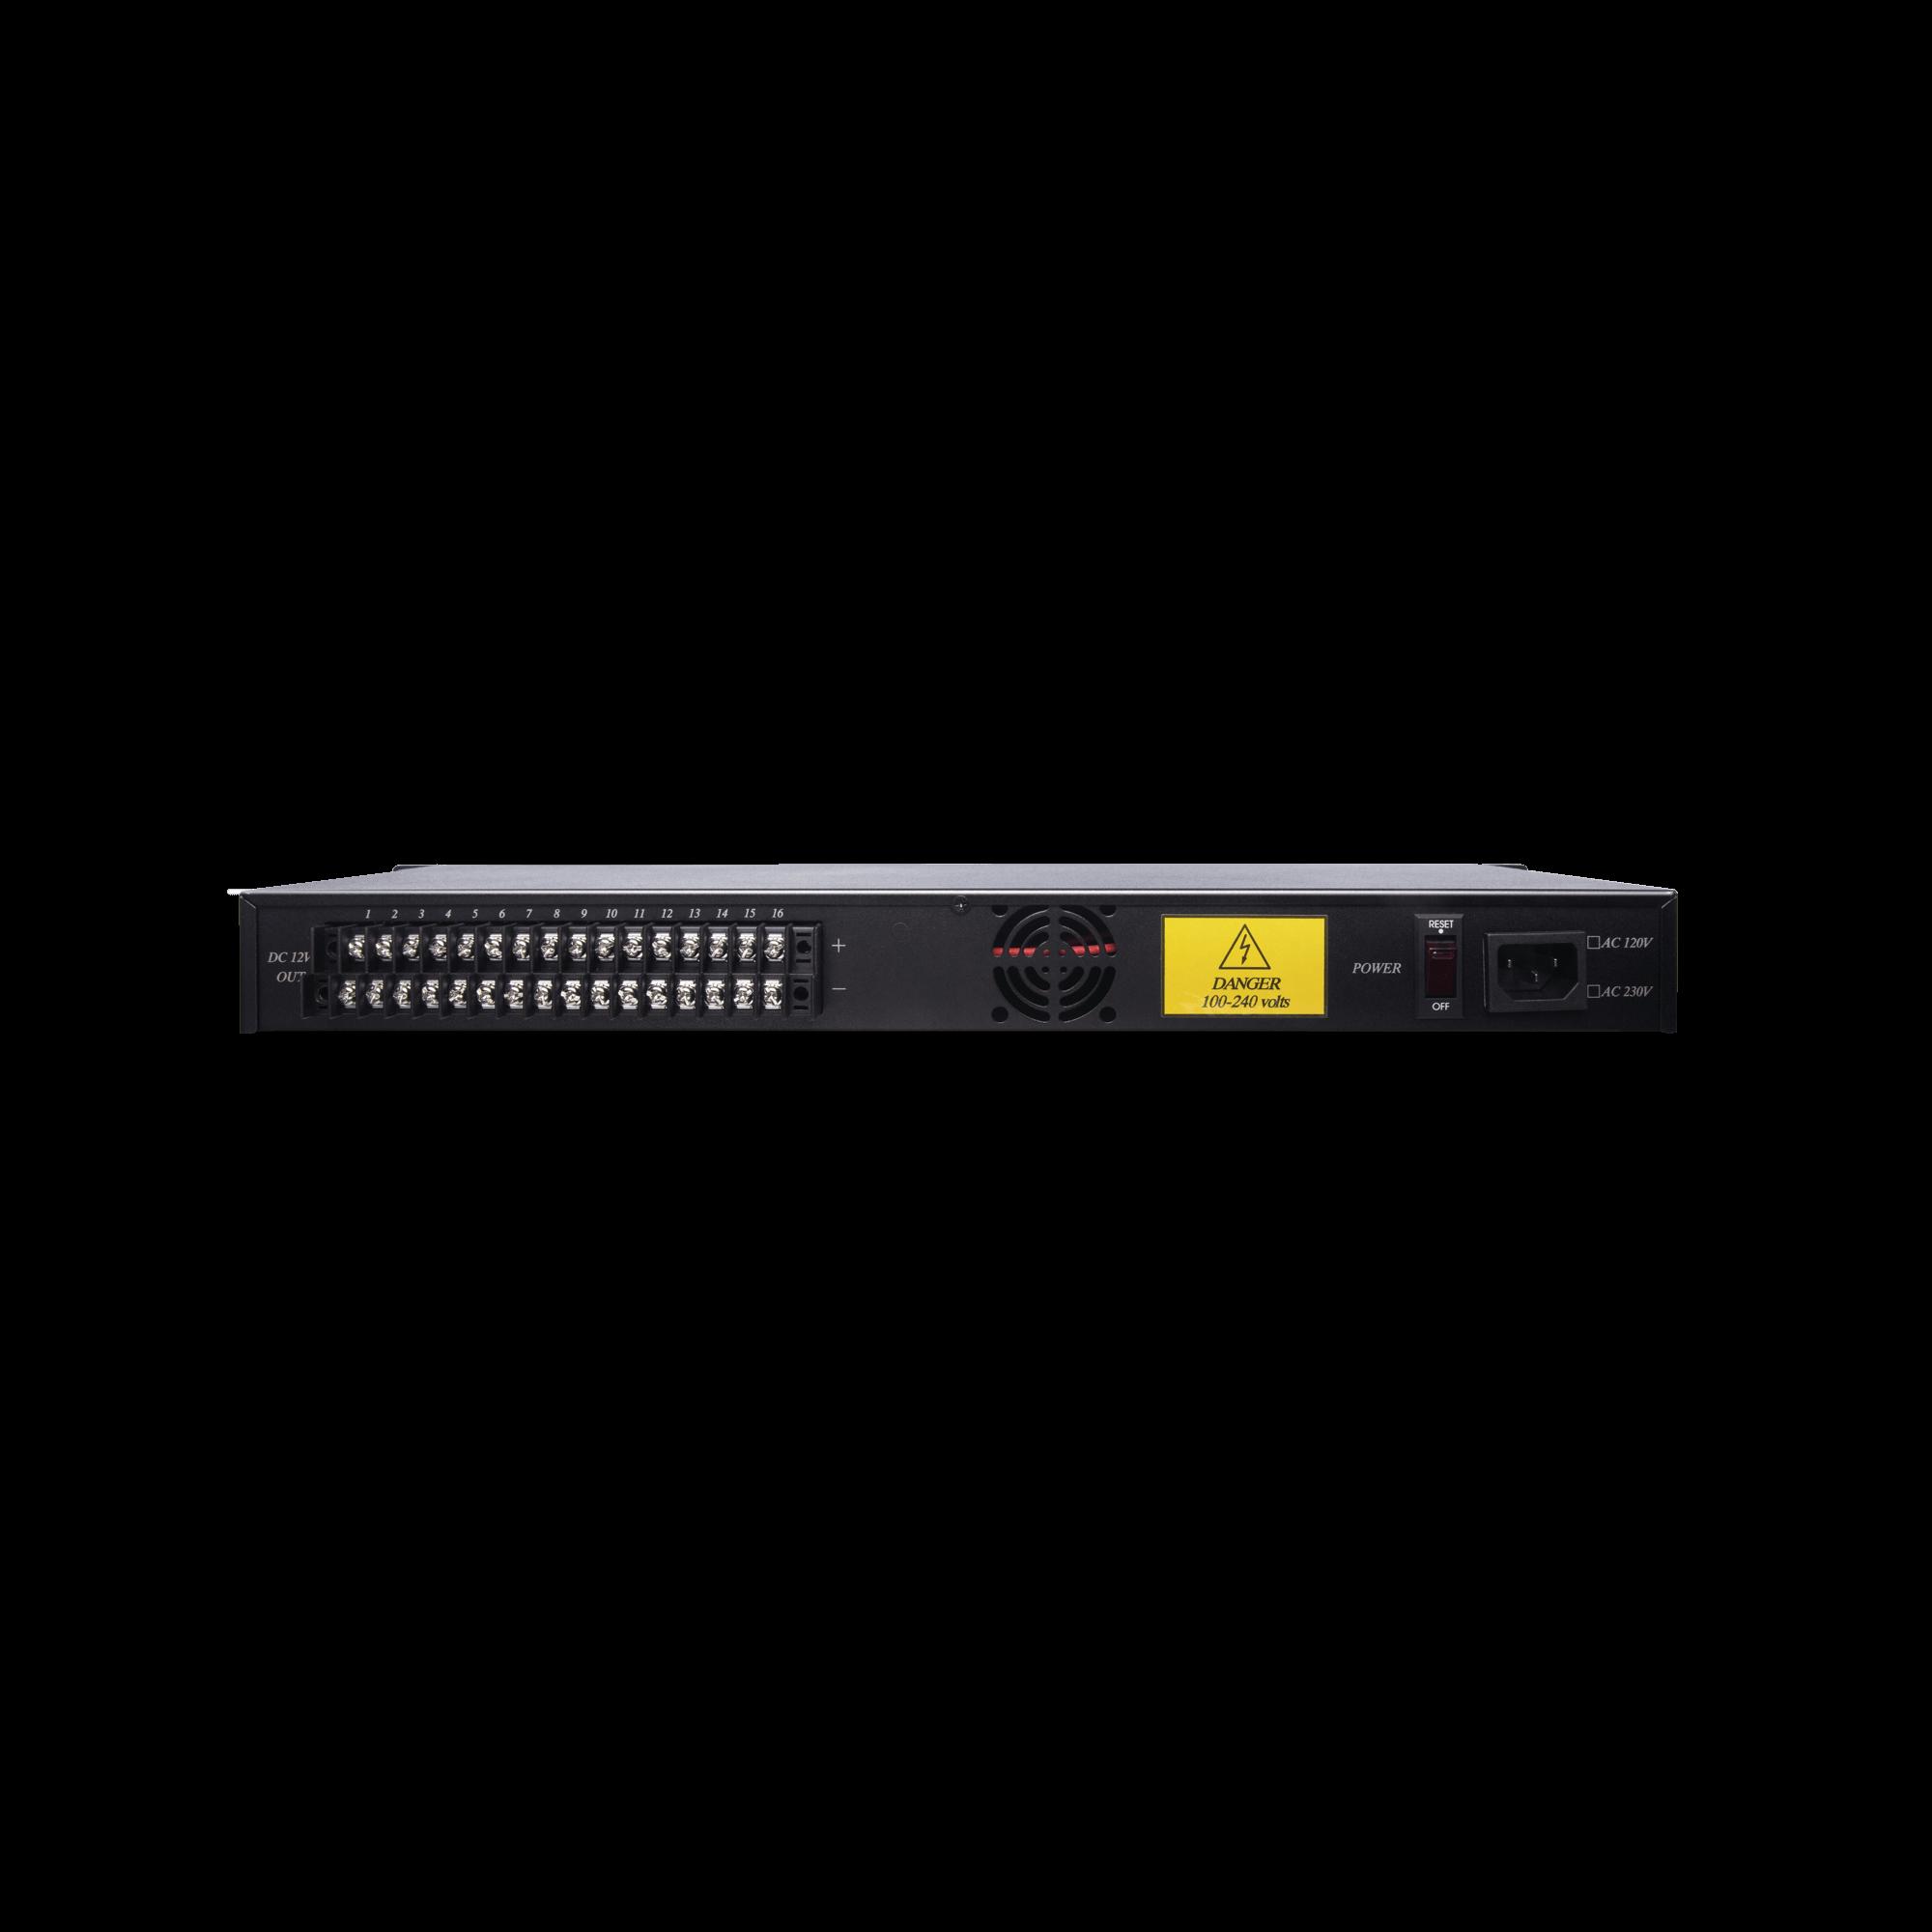 16 Ports DC5V 10A Power Supply